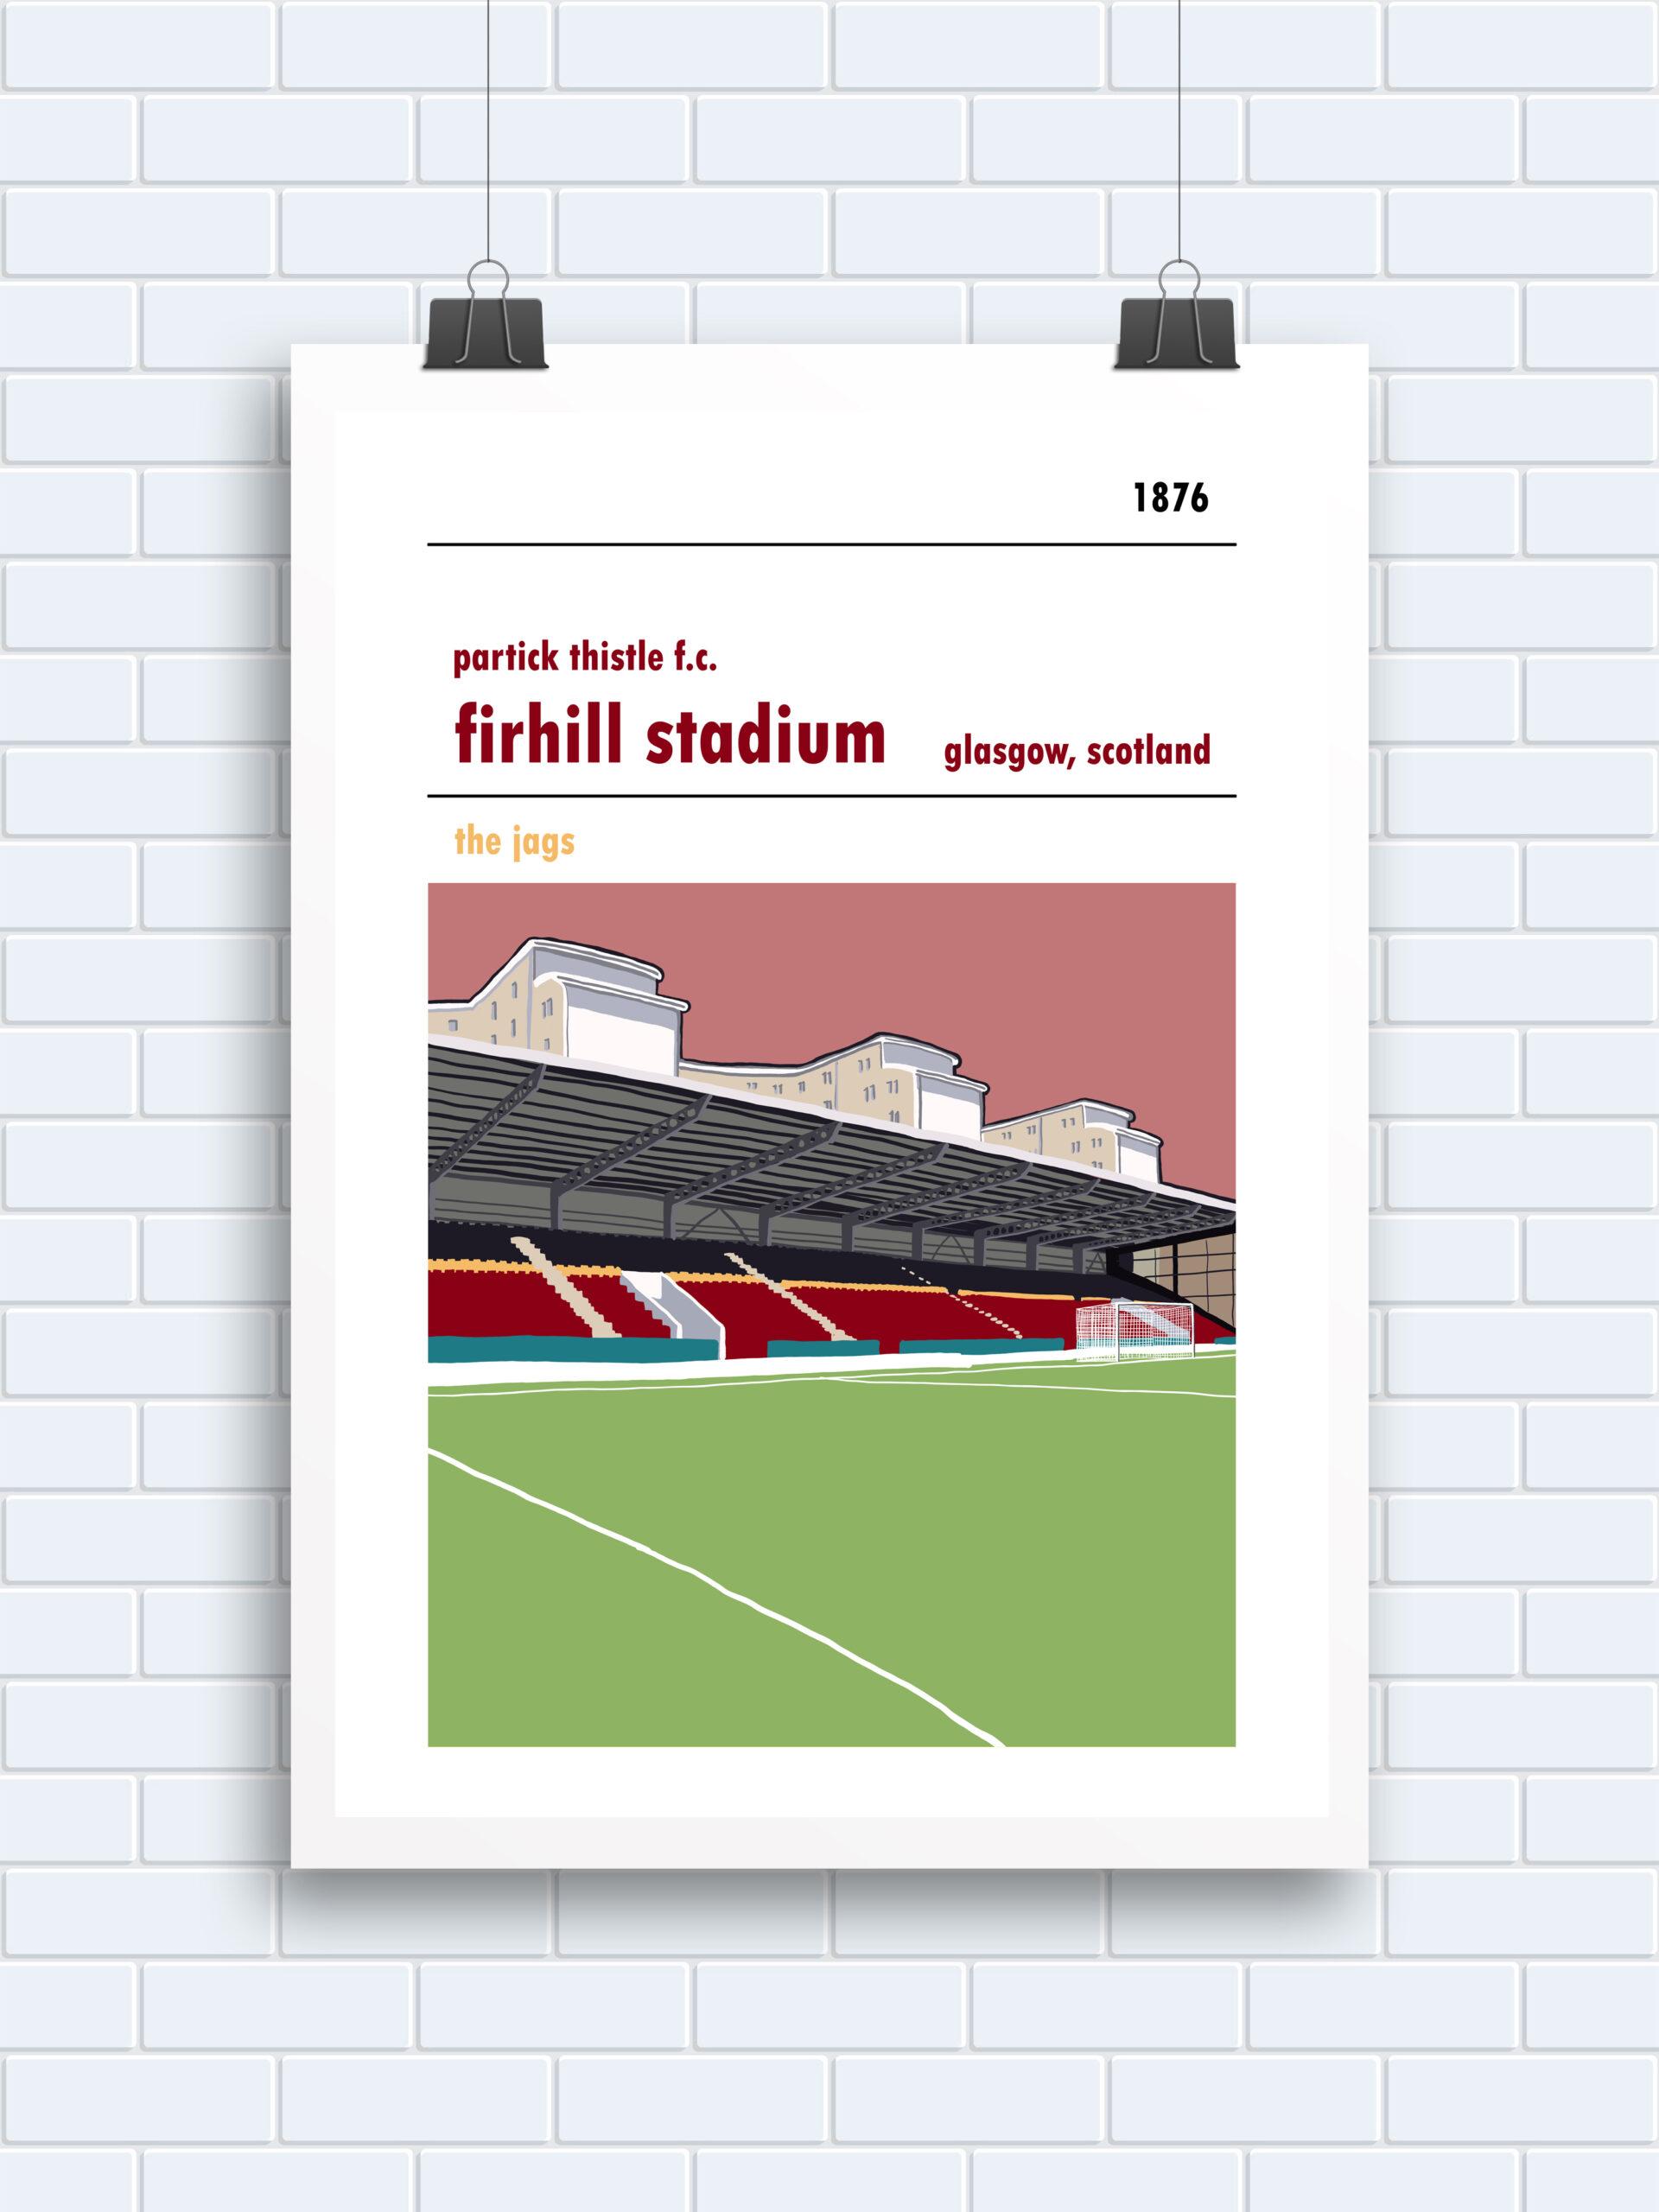 Firhill Stadium, Glasgow